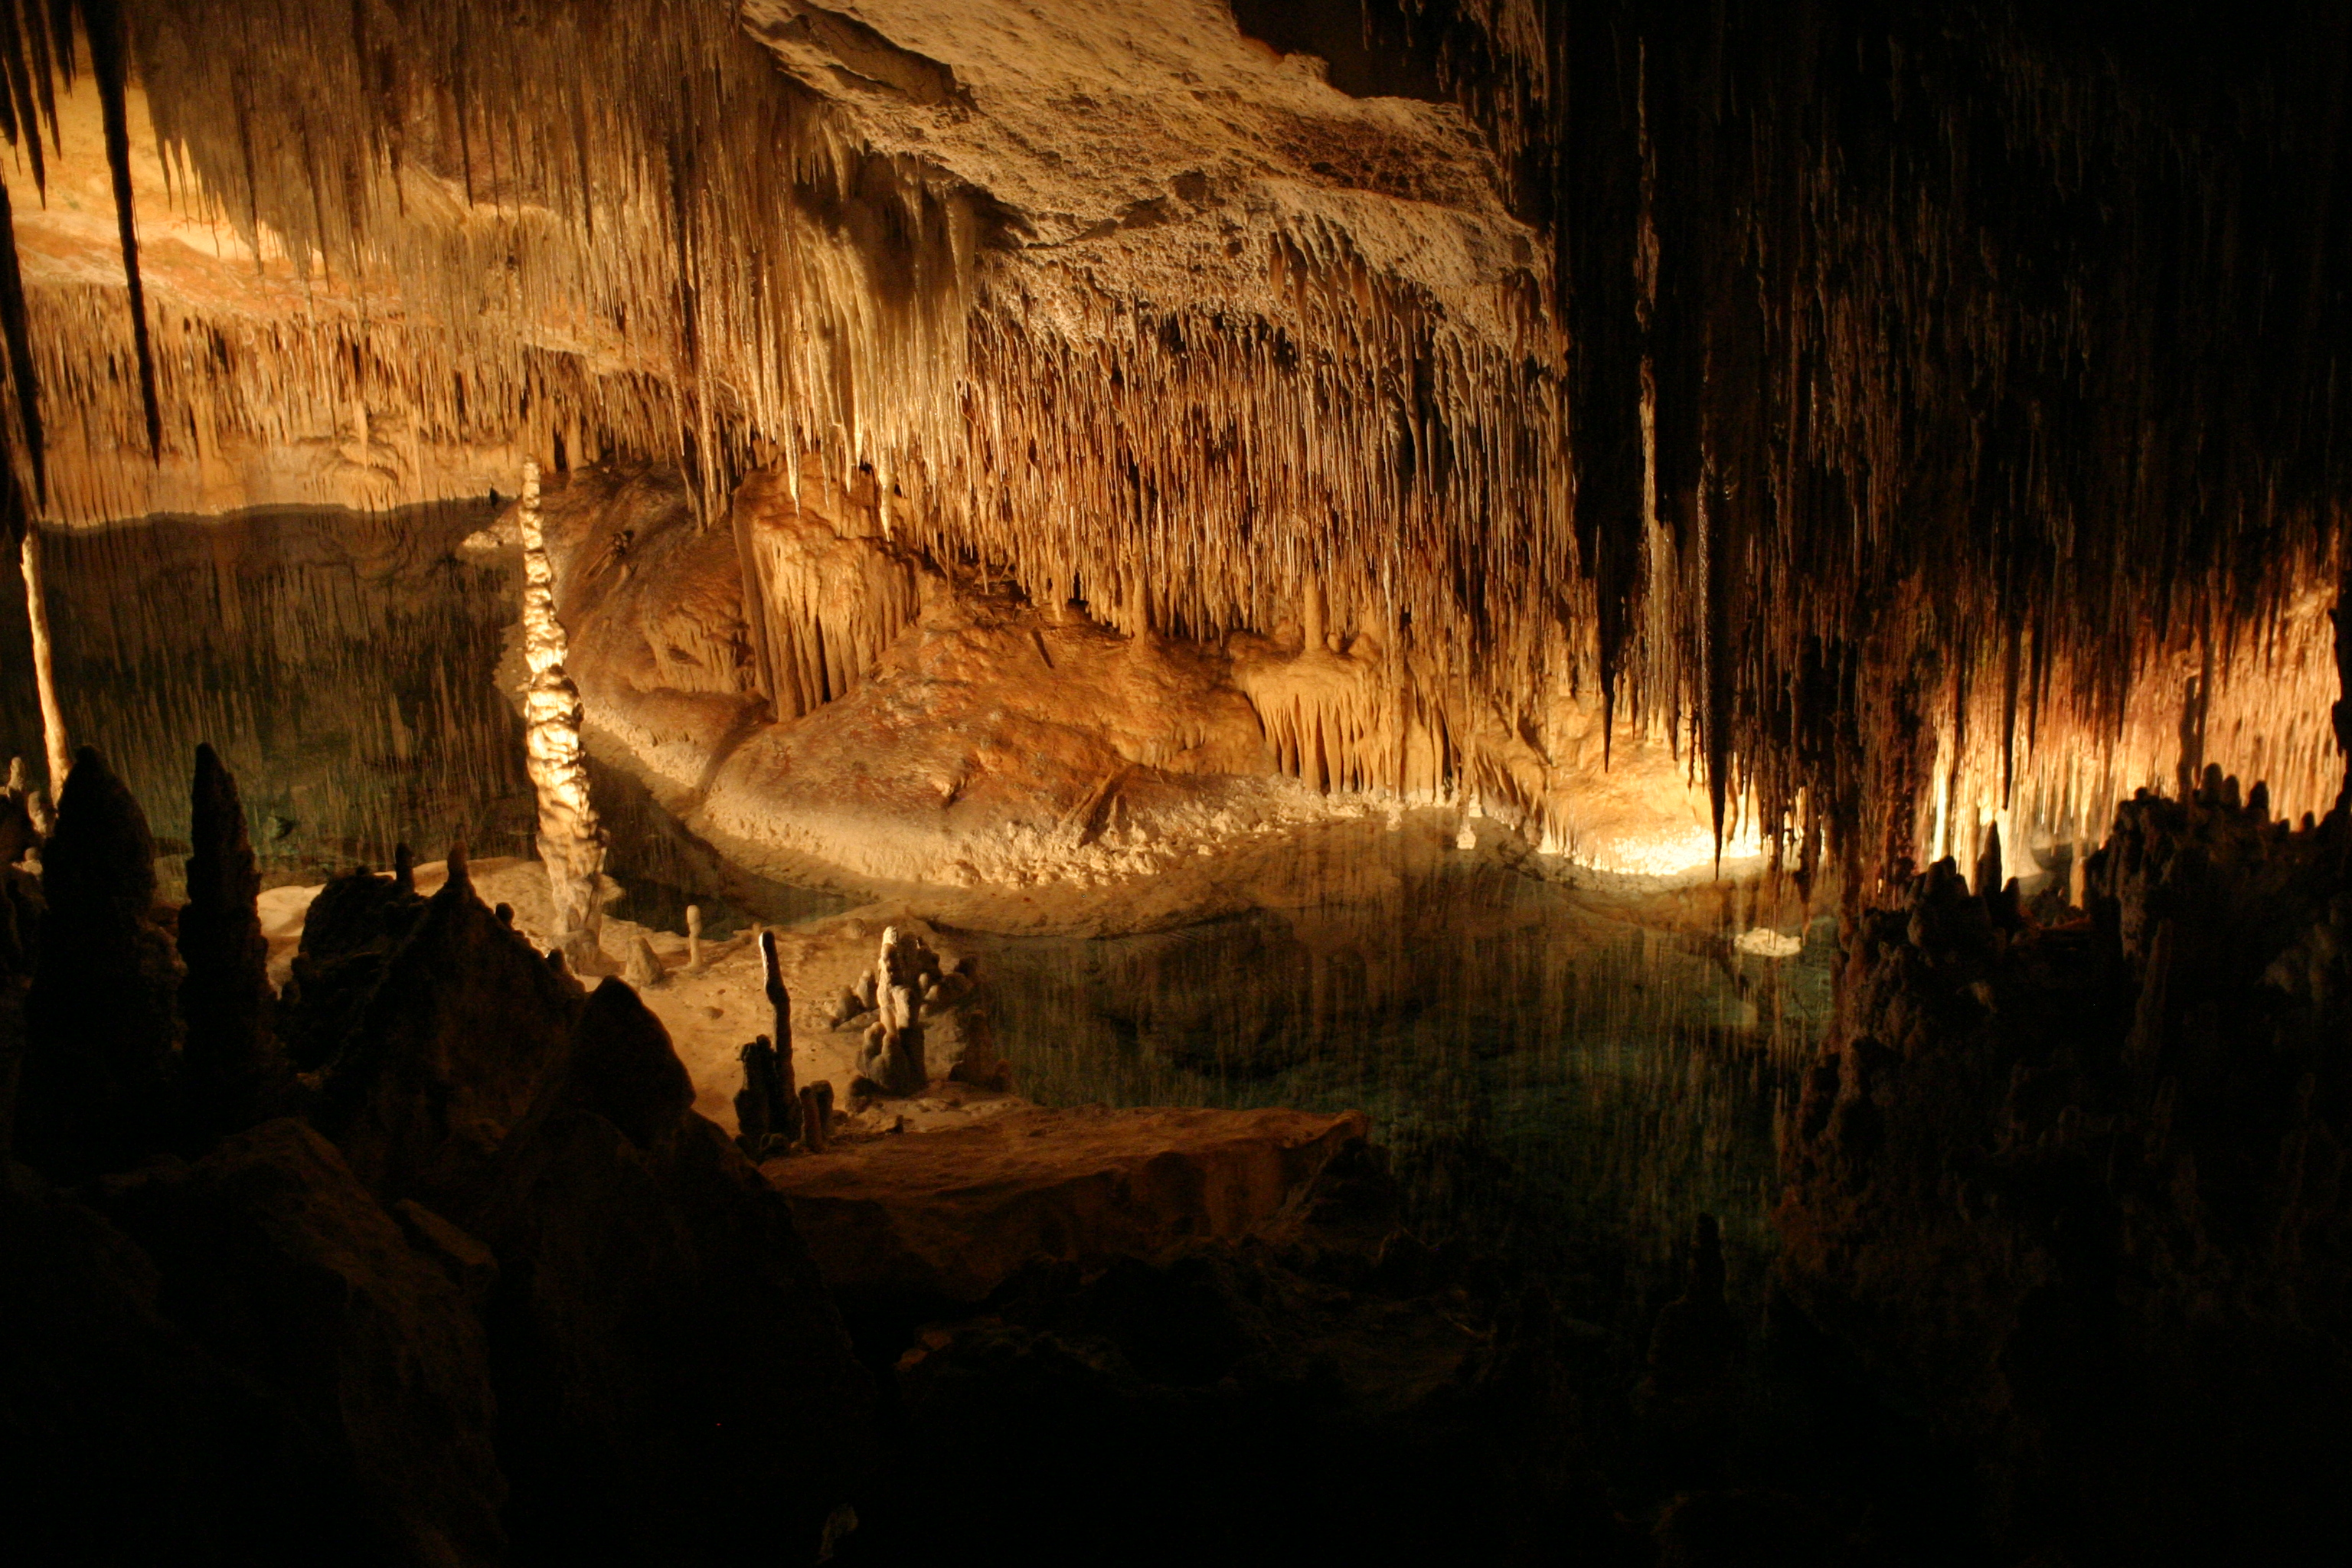 Image of Interior_de_las_Cuevas_del_Drach.jpg#: http://commons.wikimedia.org/wiki/Special:FilePath/Interior_de_las_Cuevas_del_Drach.jpg